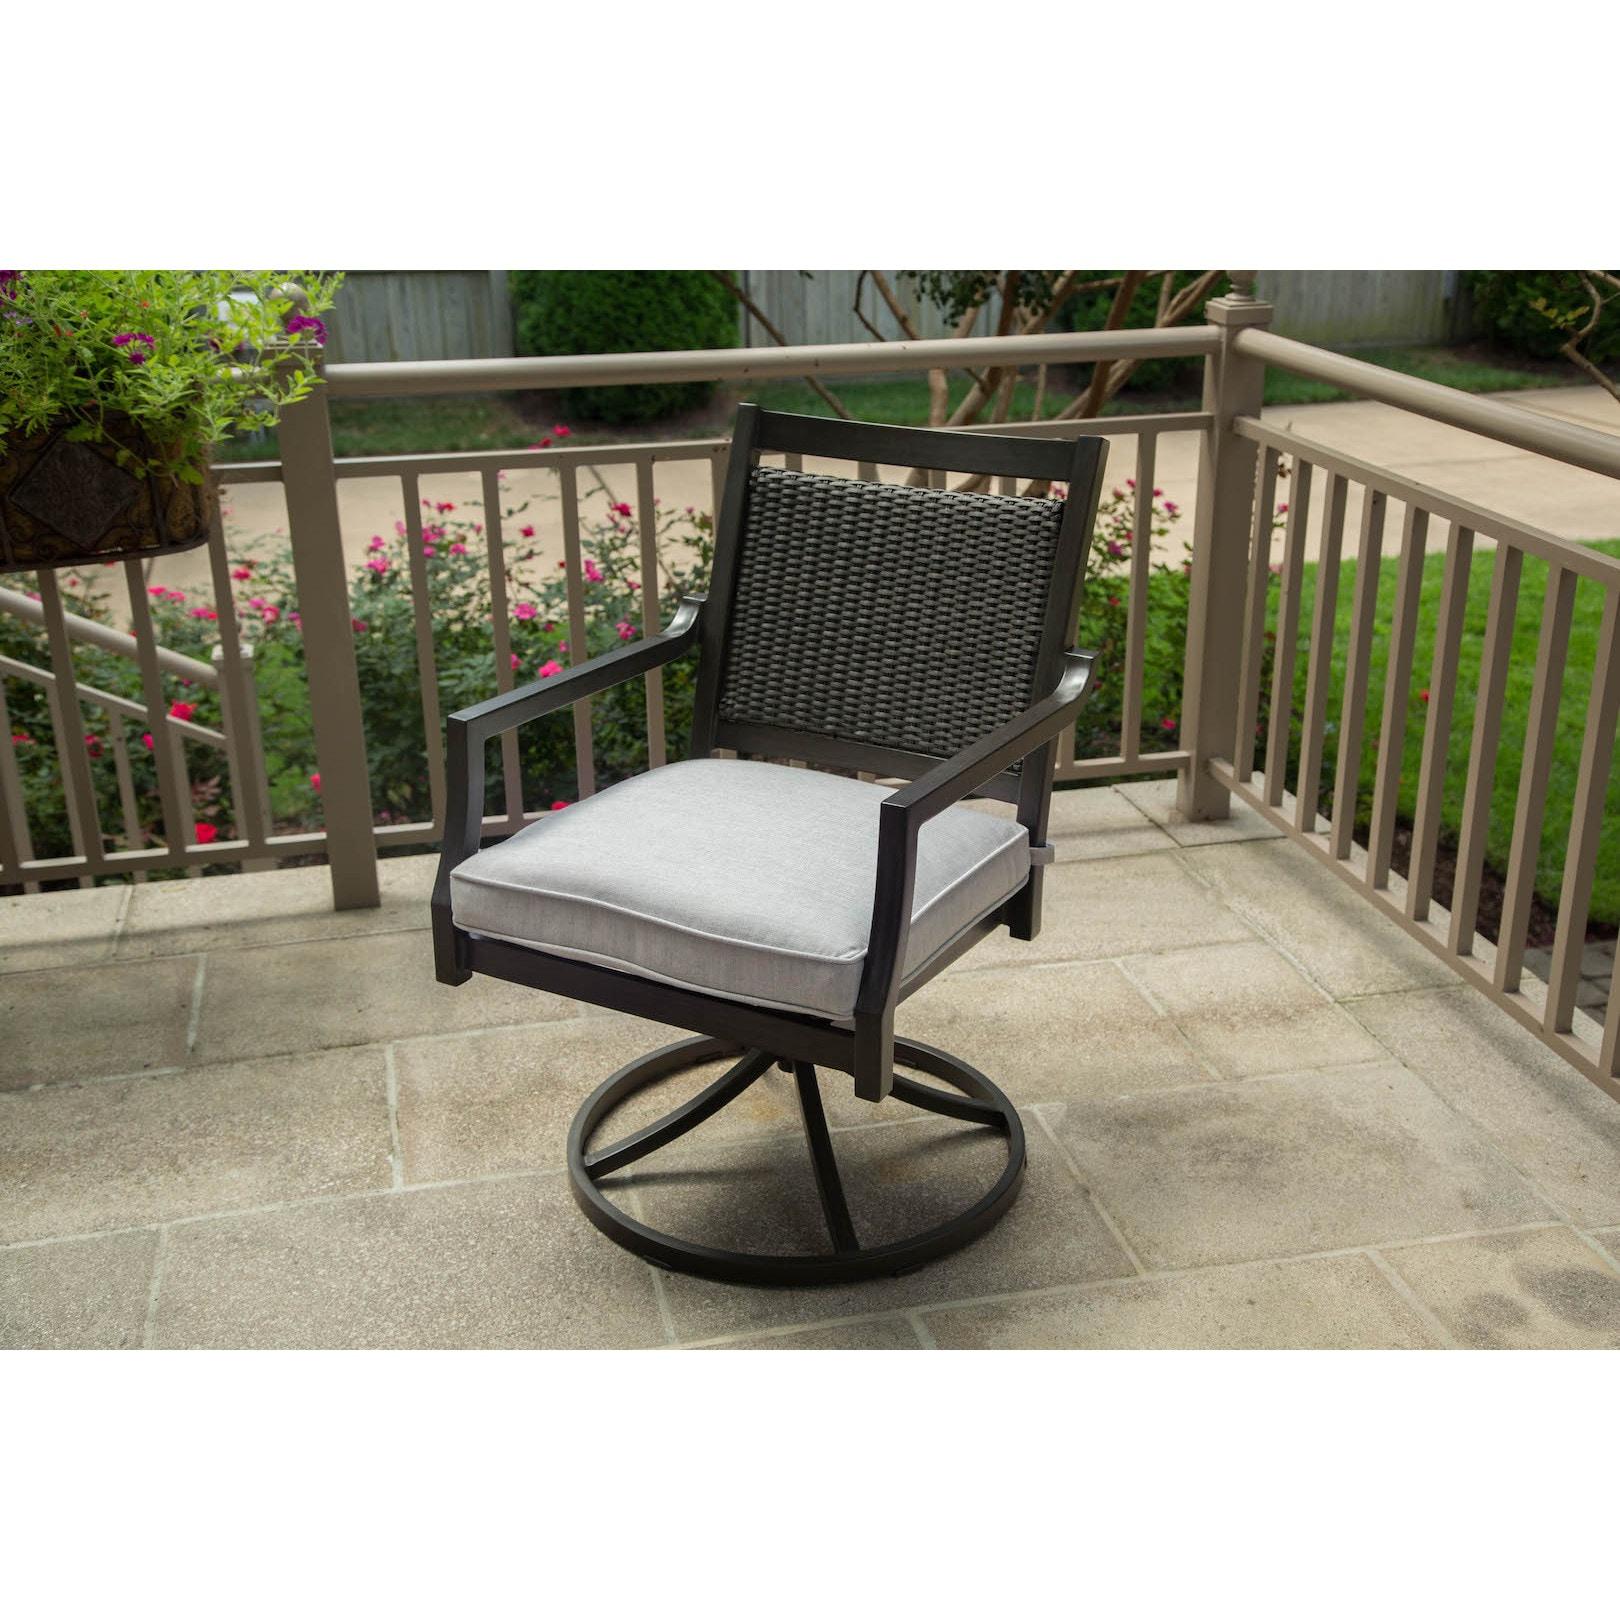 Stupendous Agio Maddox Swivel Rocker Ibusinesslaw Wood Chair Design Ideas Ibusinesslaworg